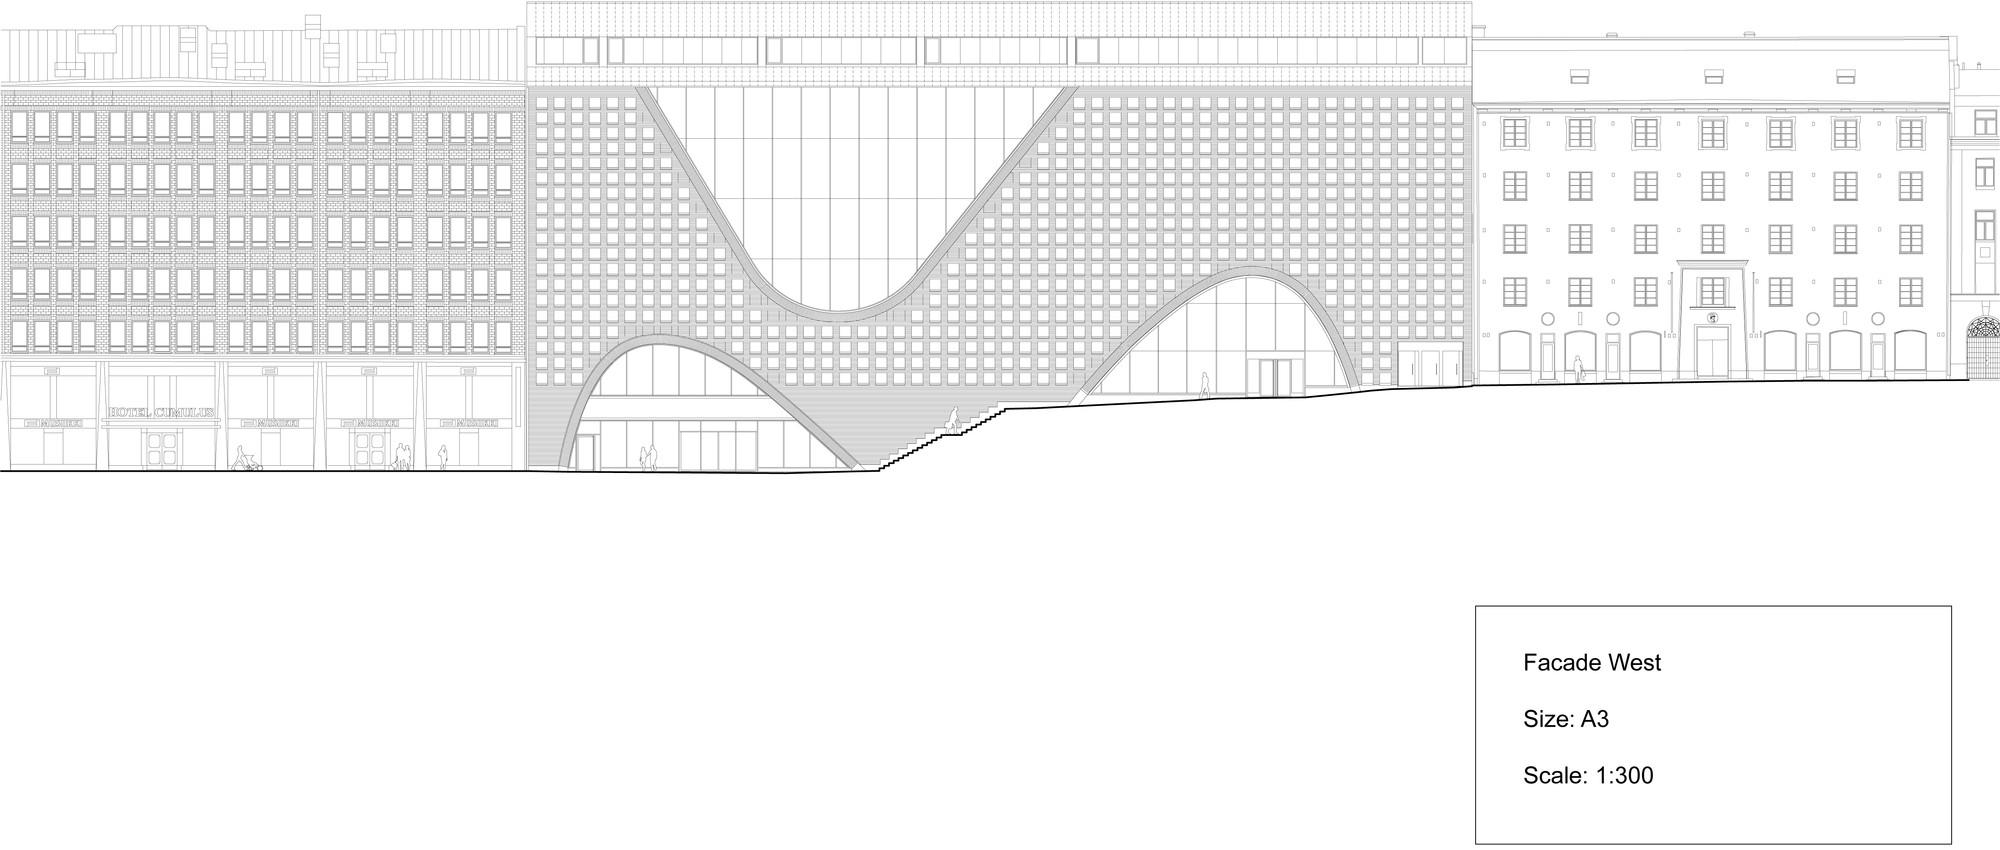 Arhitektura Copy_kaisa_julkisivu_l%C3%A4nteen_A3_300_copia